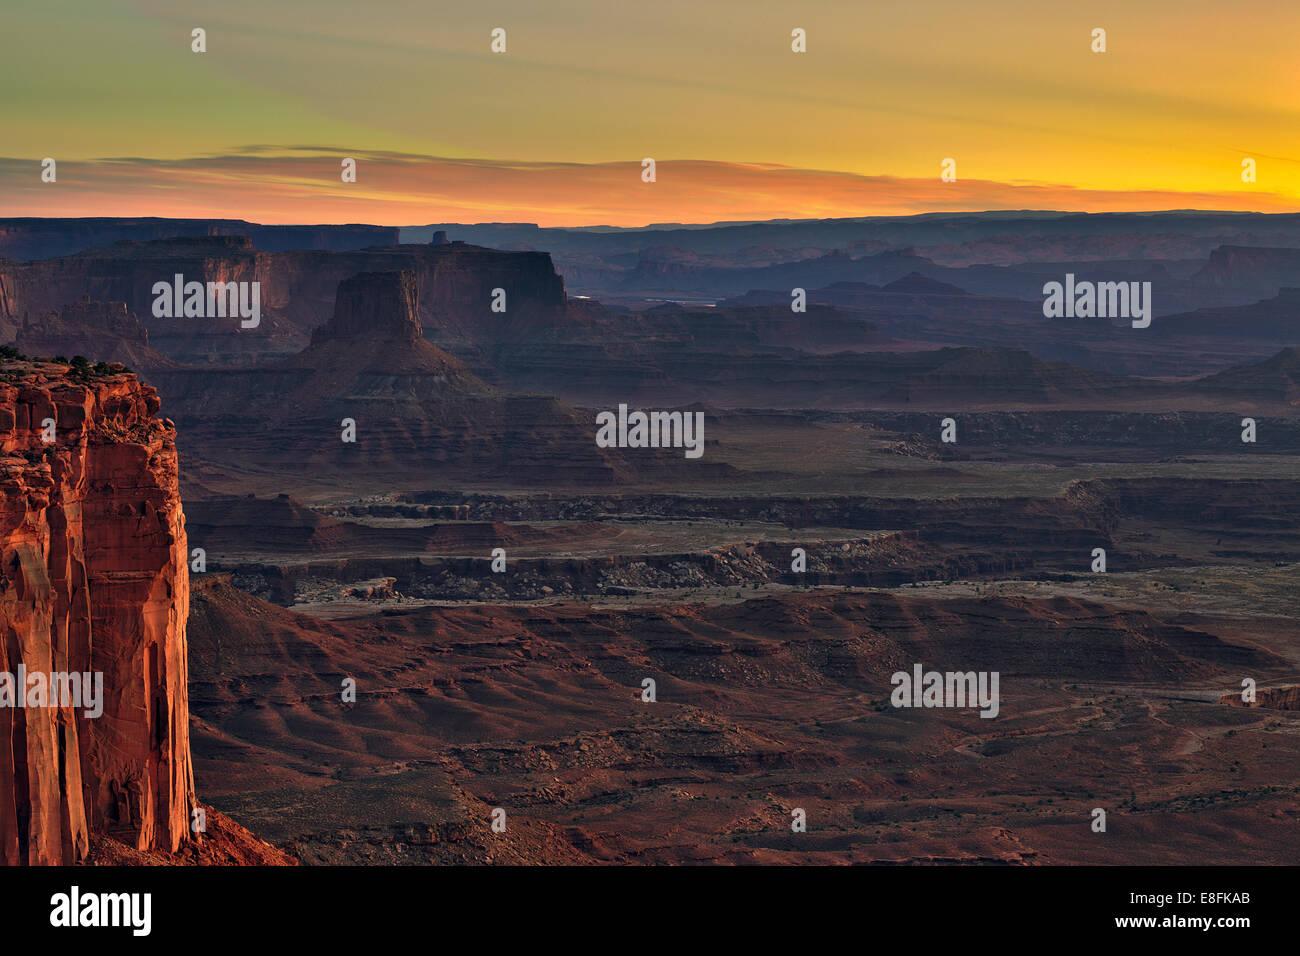 USA, Utah, San Juan, Grand View Point Road, Canyonlands National Park, View of canyon - Stock Image